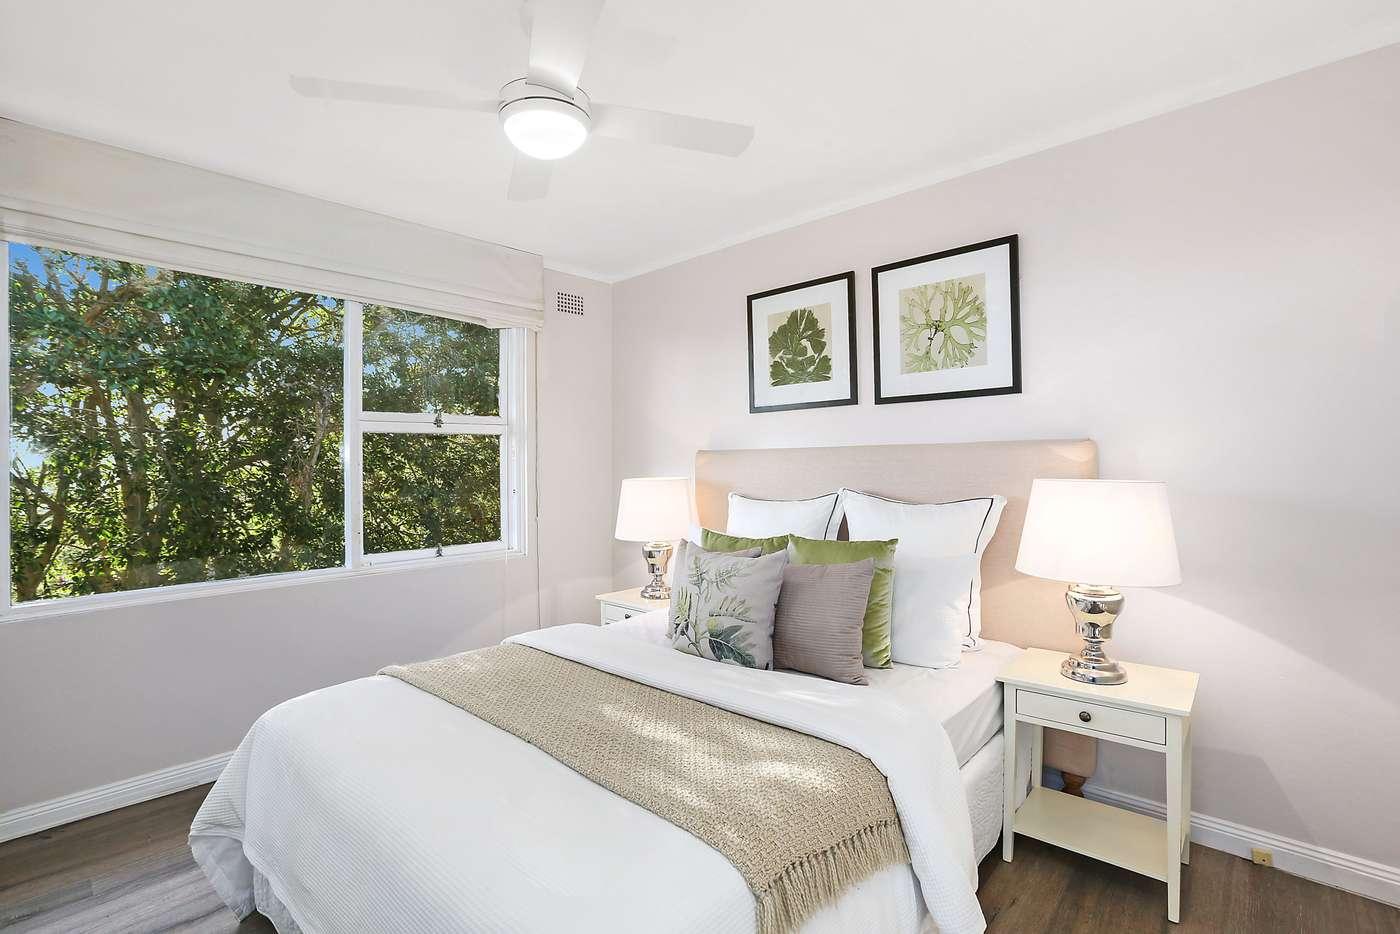 Fifth view of Homely apartment listing, 12/90 Raglan Street, Mosman NSW 2088